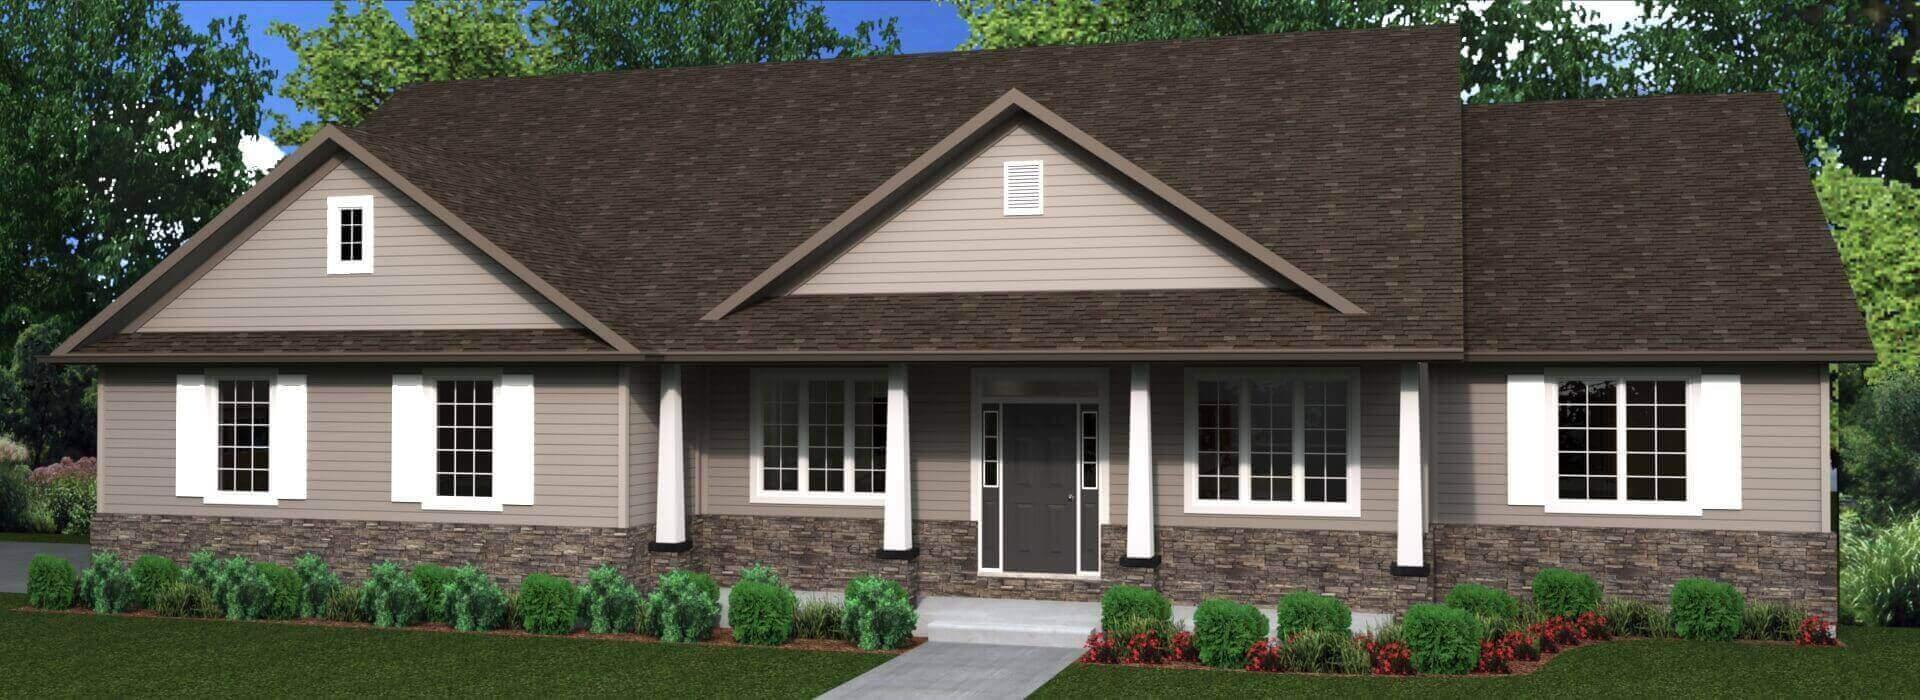 2281 house elevation